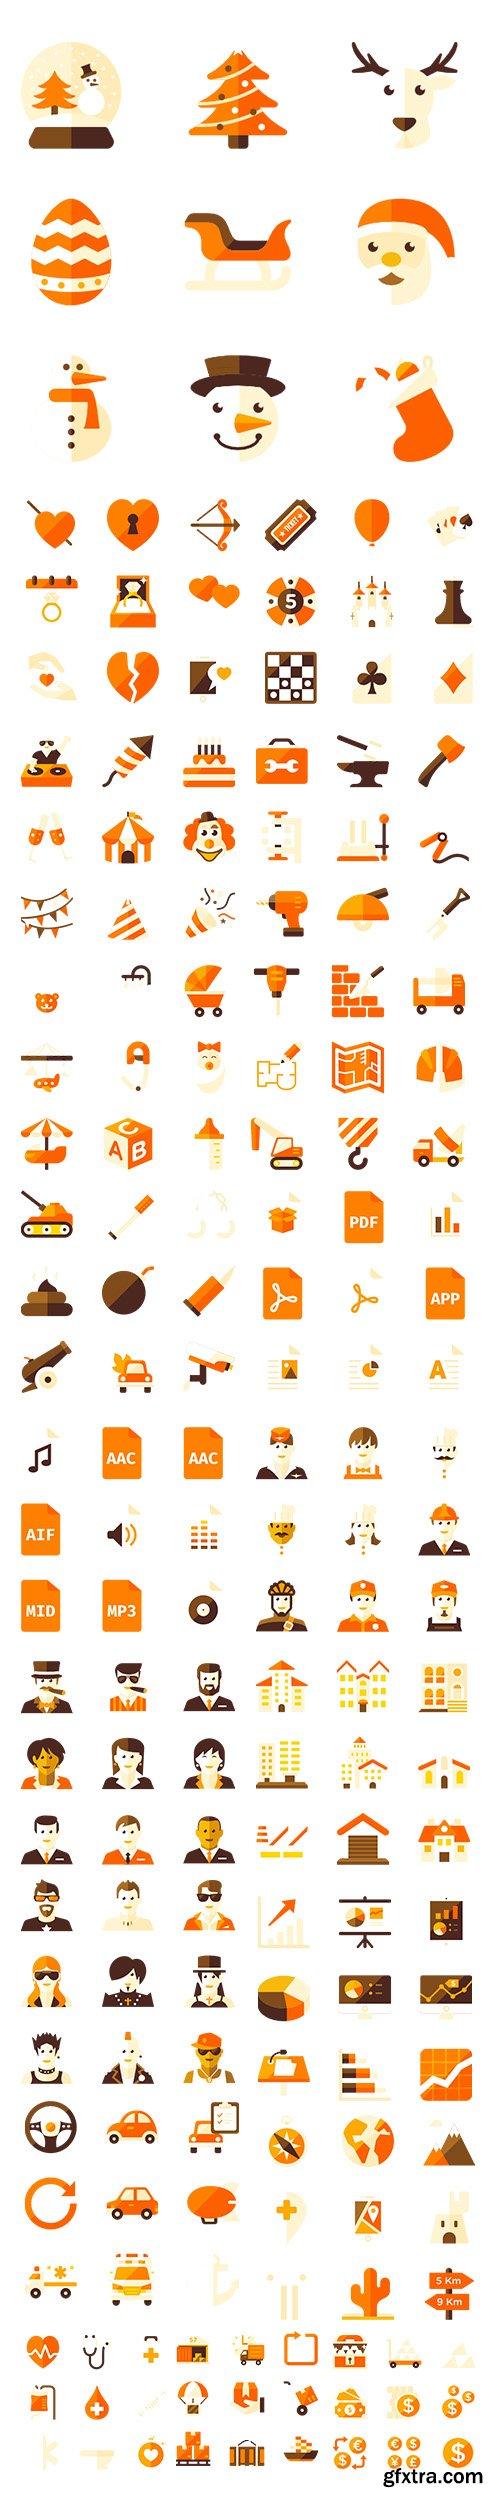 450+ Big Orange Icons Pack